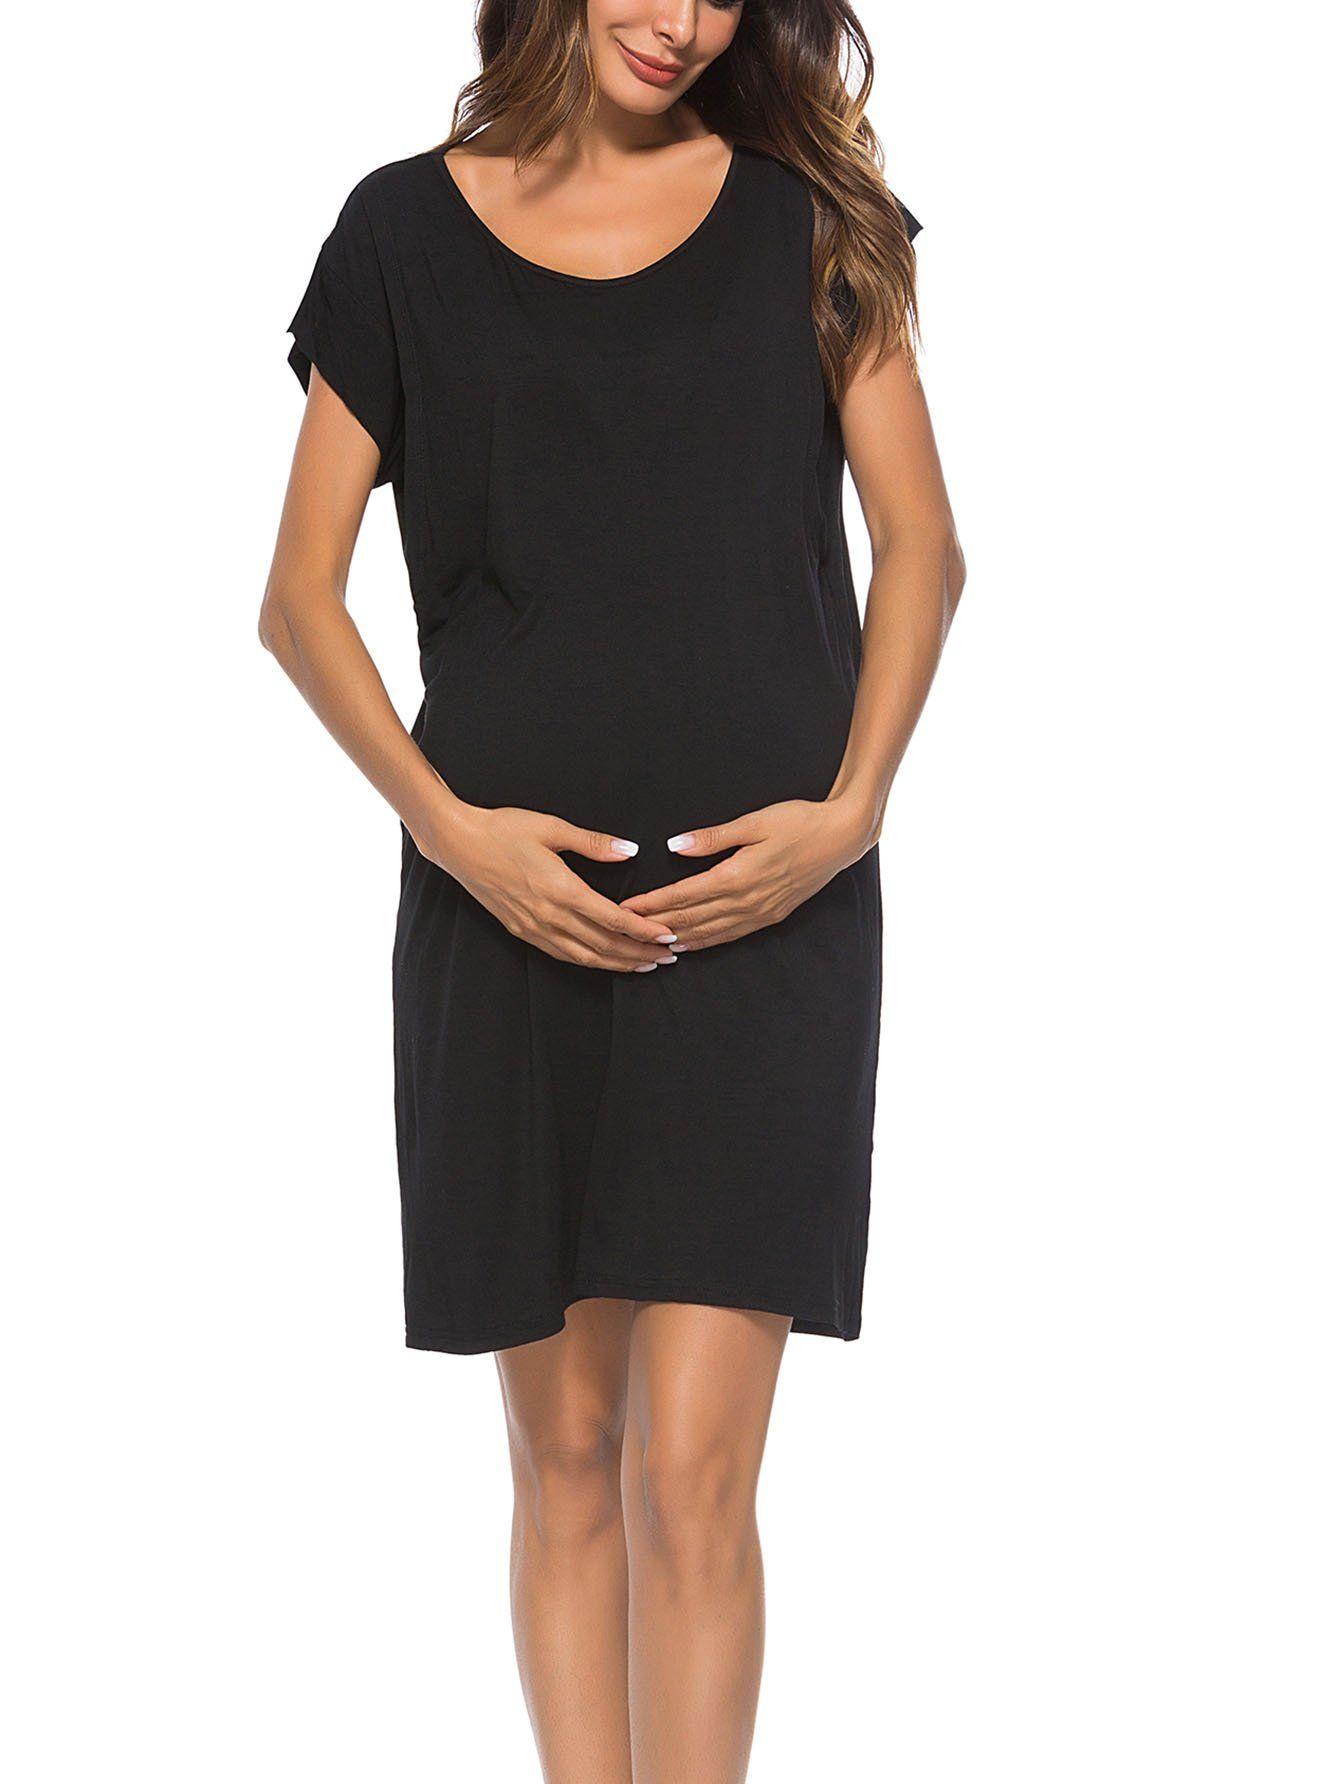 88d38e3fccc Maternity Dresses - WOAIVOOU Womens Summer Short Sleeve Loose Nursing Dress  Layered Breastfeeding Dress Midi Black S * Click photo to assess even more  ...